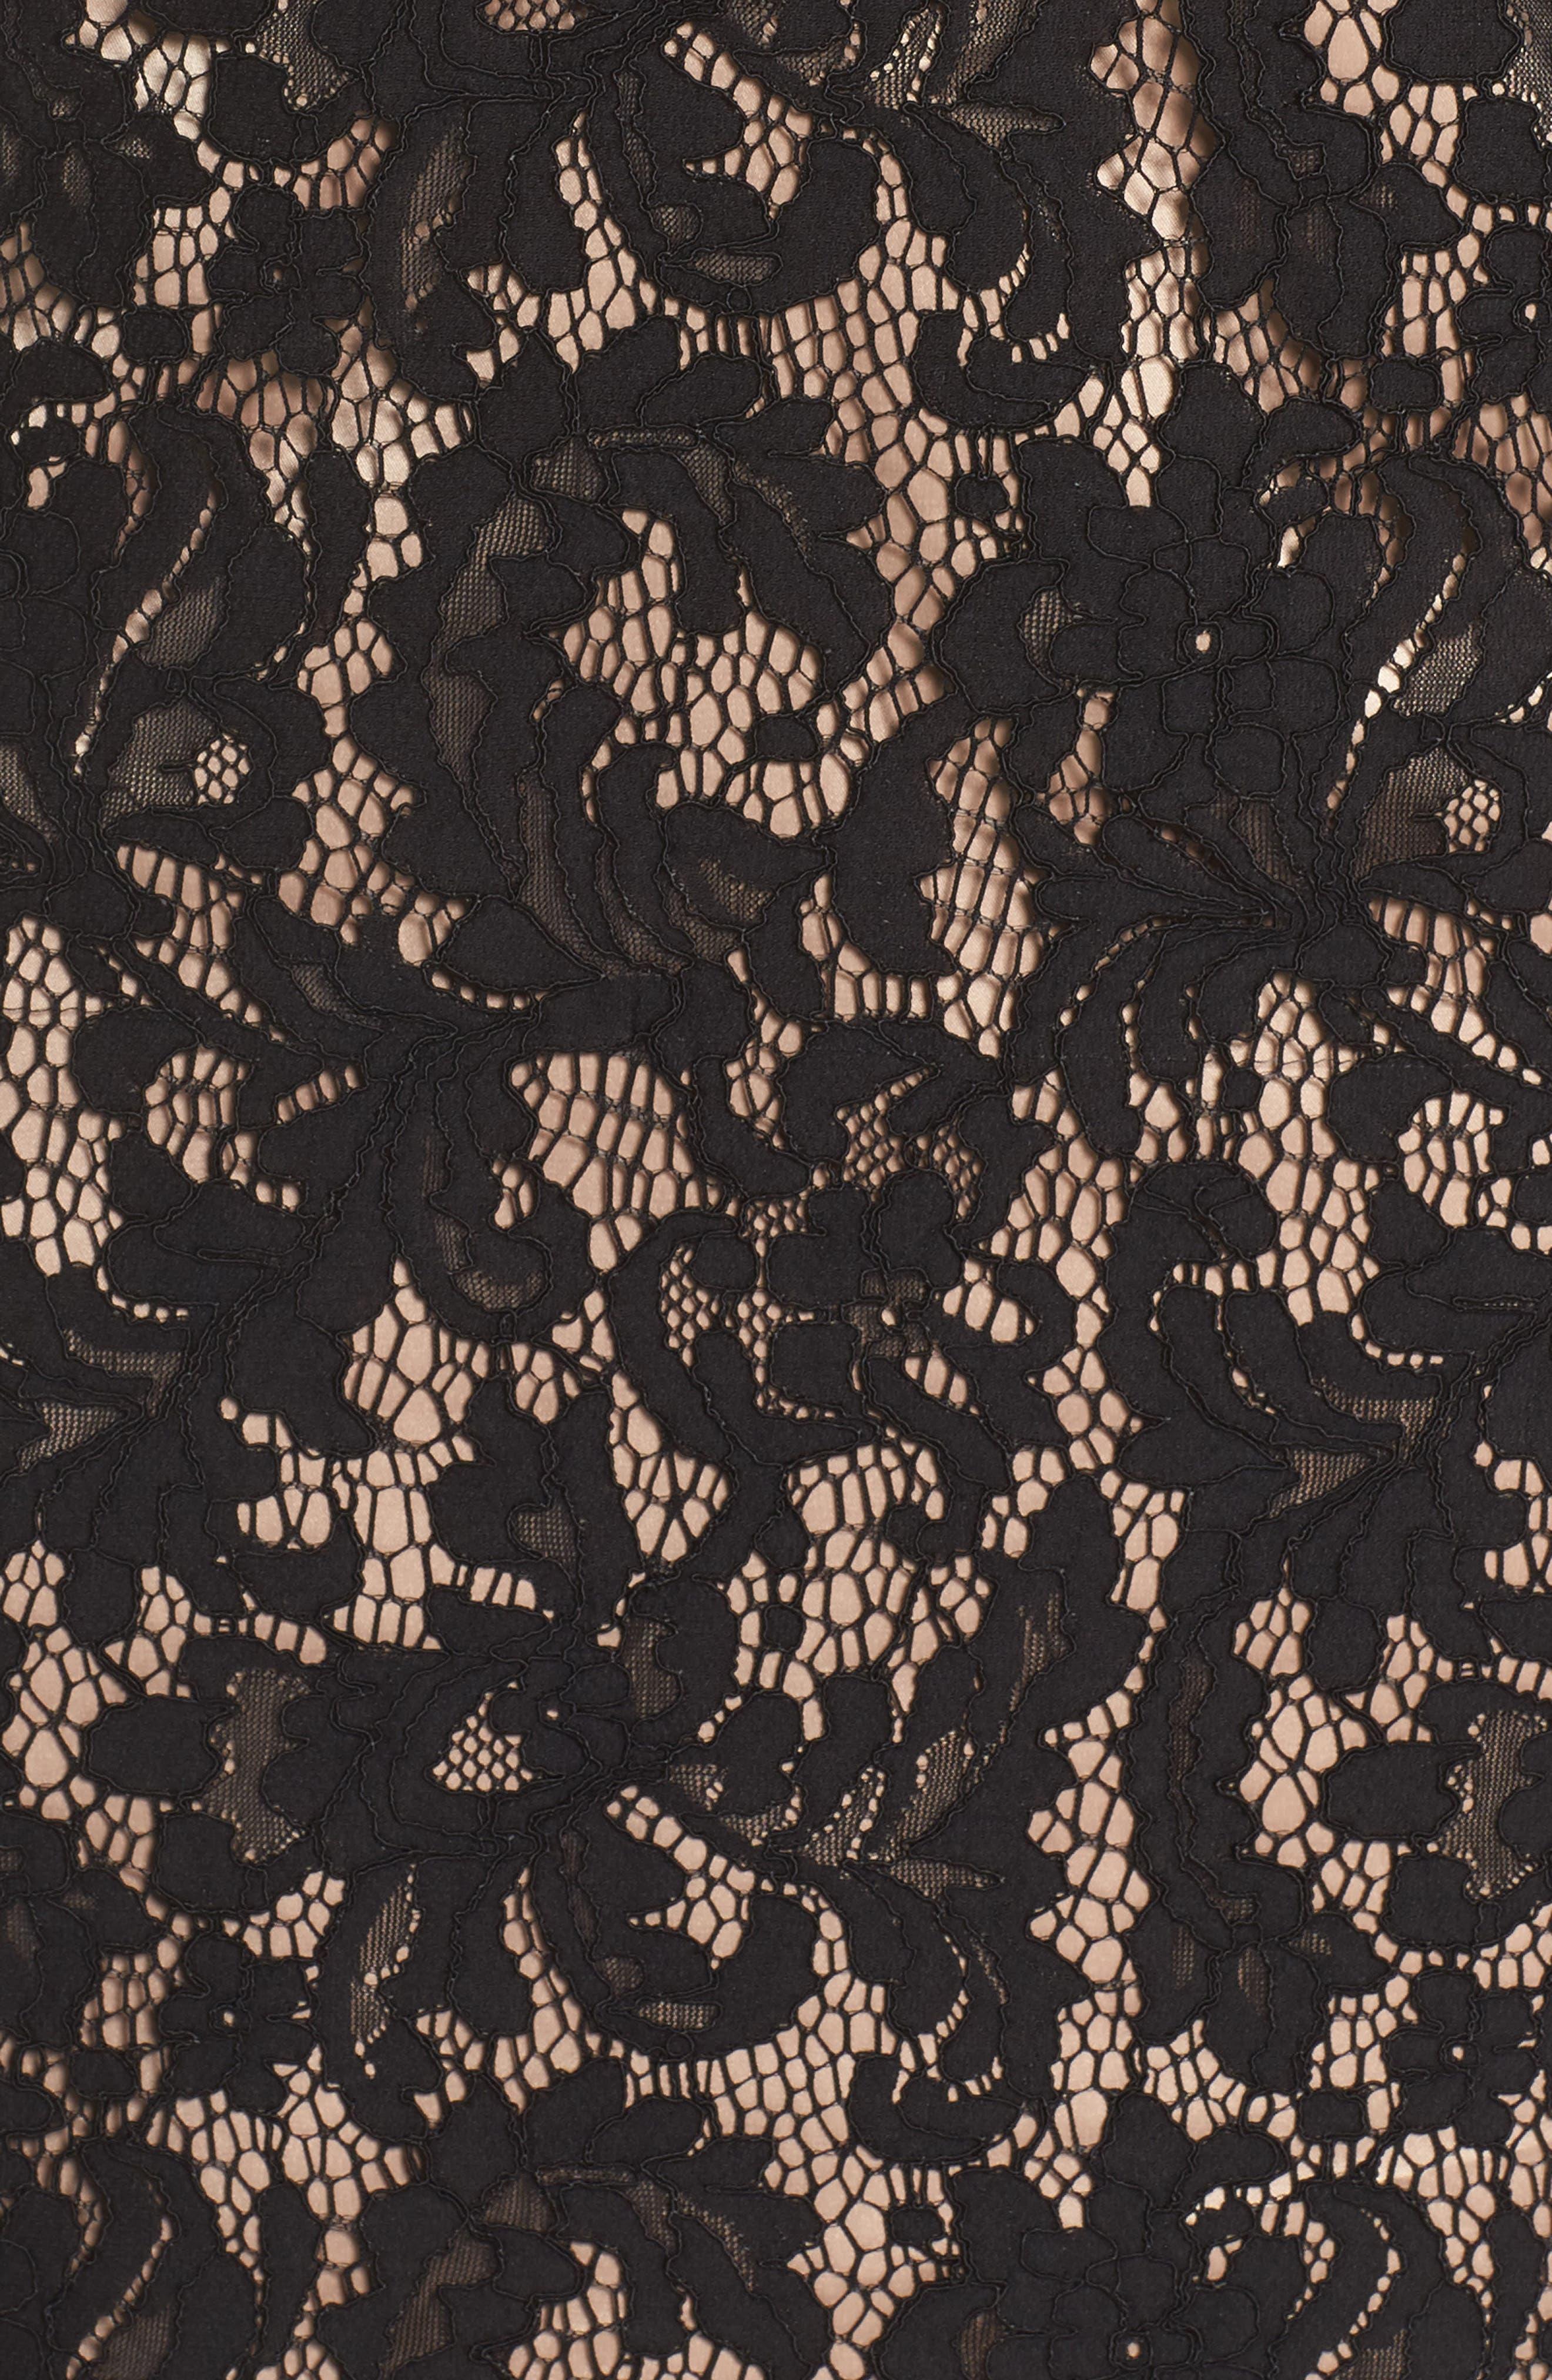 Illusion Lace Sheath Dress,                             Alternate thumbnail 6, color,                             015